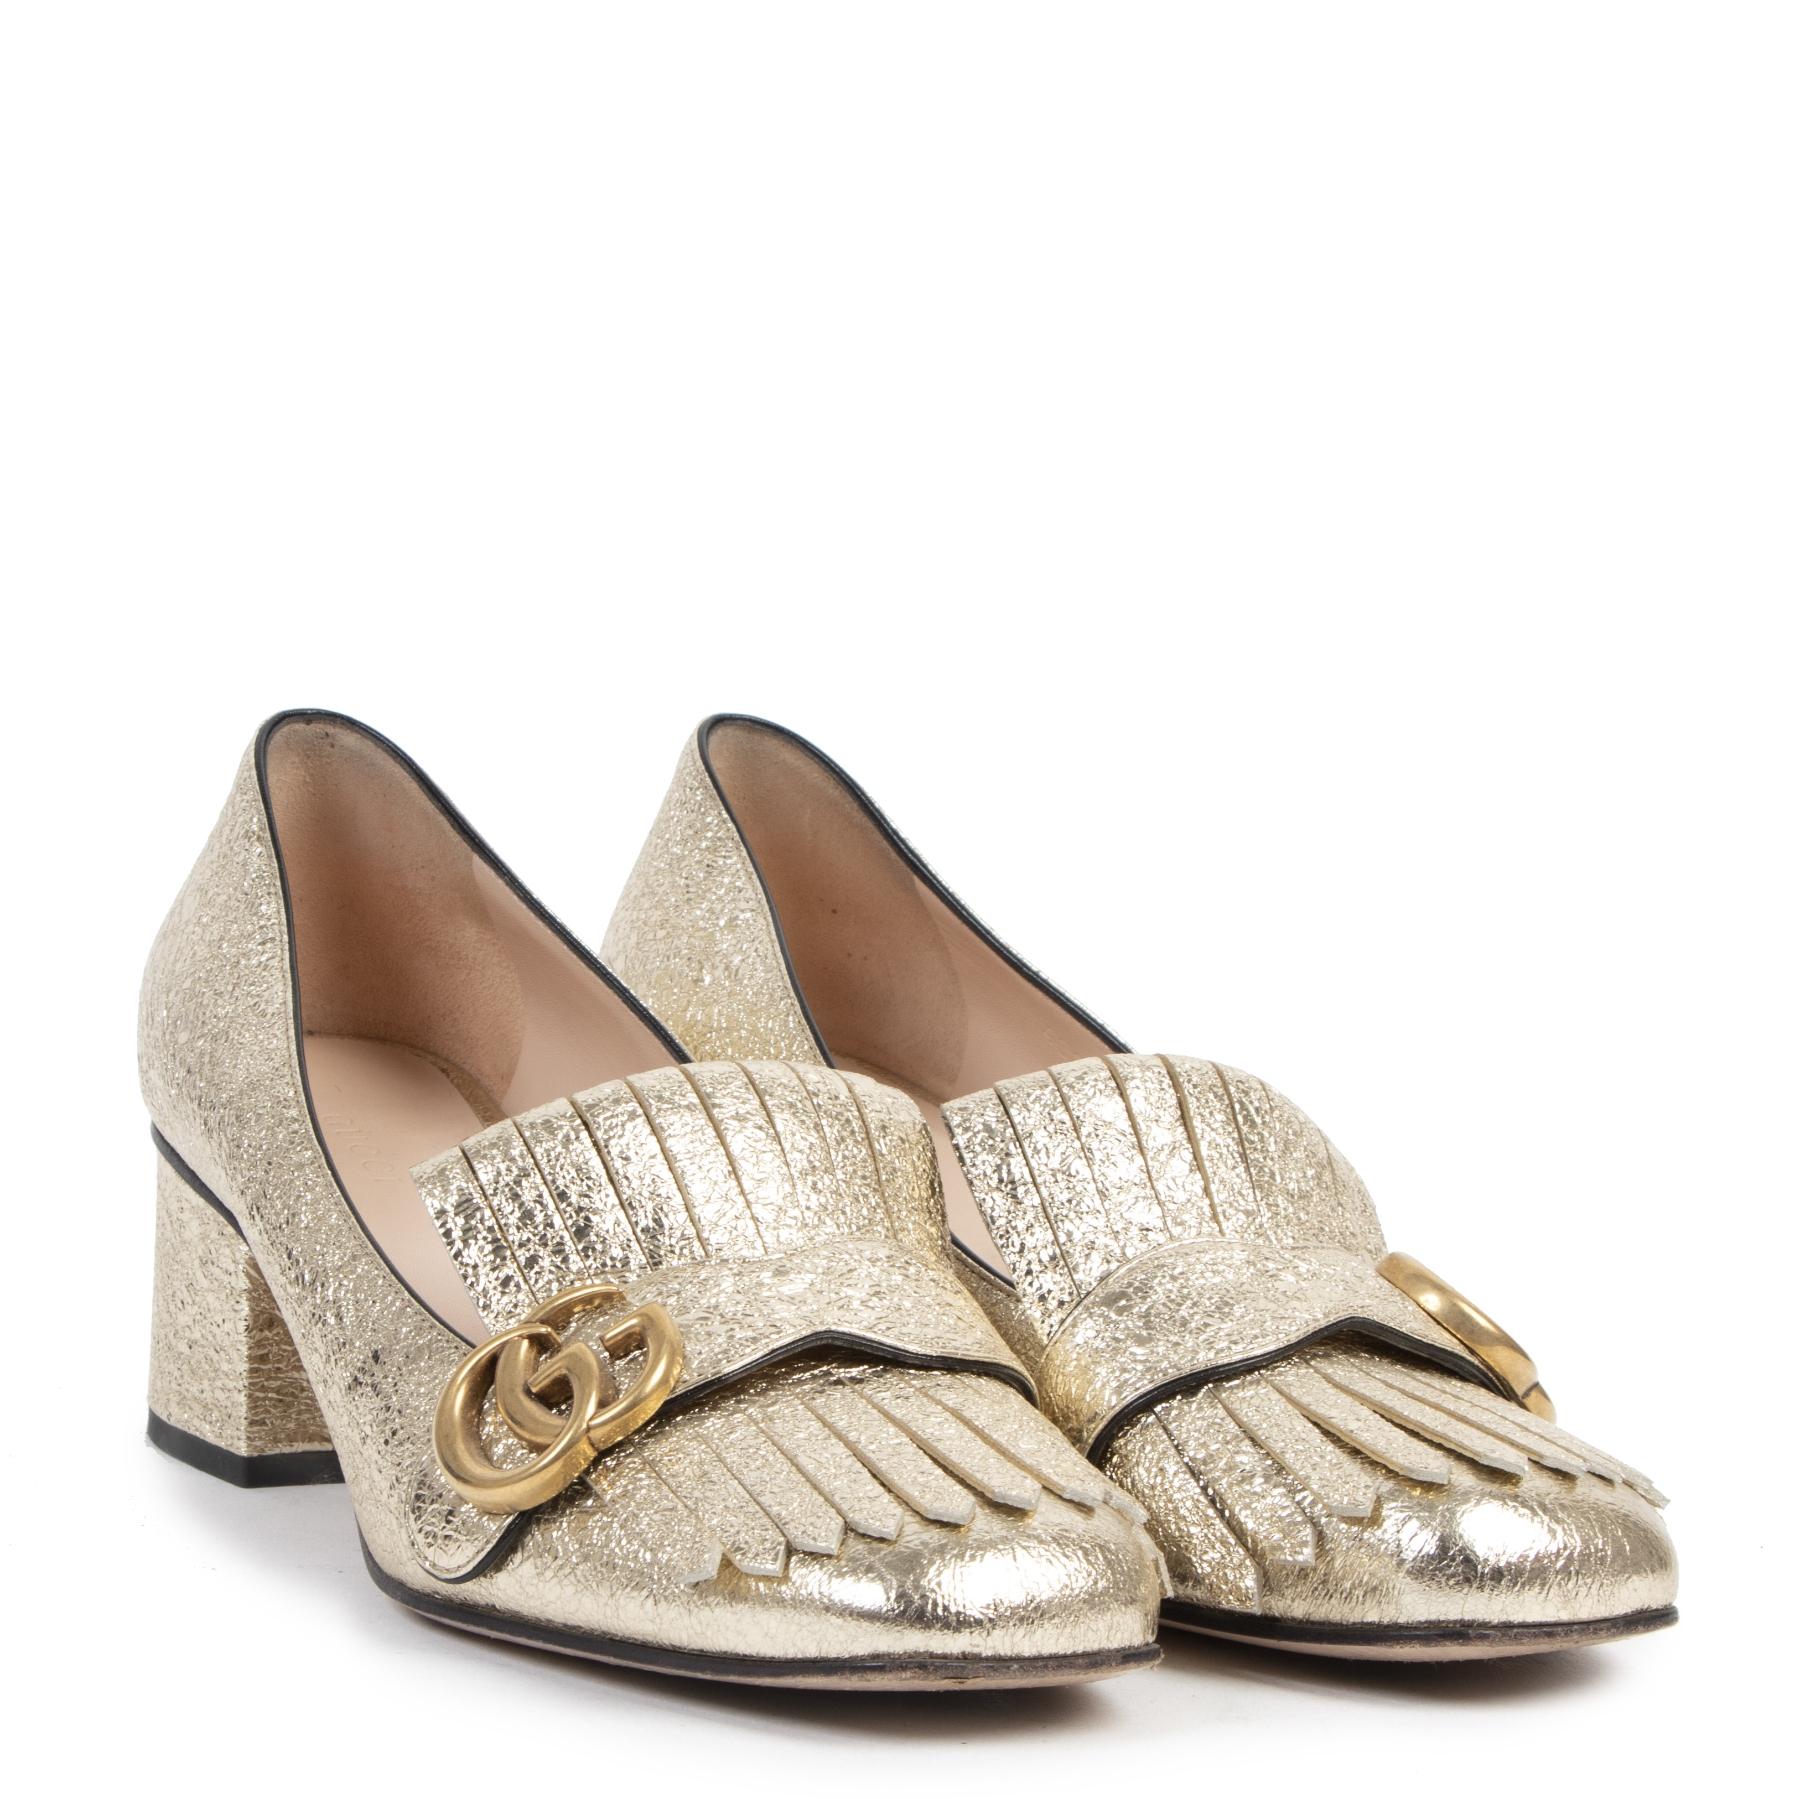 Authentieke tweedehands vintage Gucci Gold Marmont Leather Loafer Pumps - Size 39 koop online webshop LabelLOV